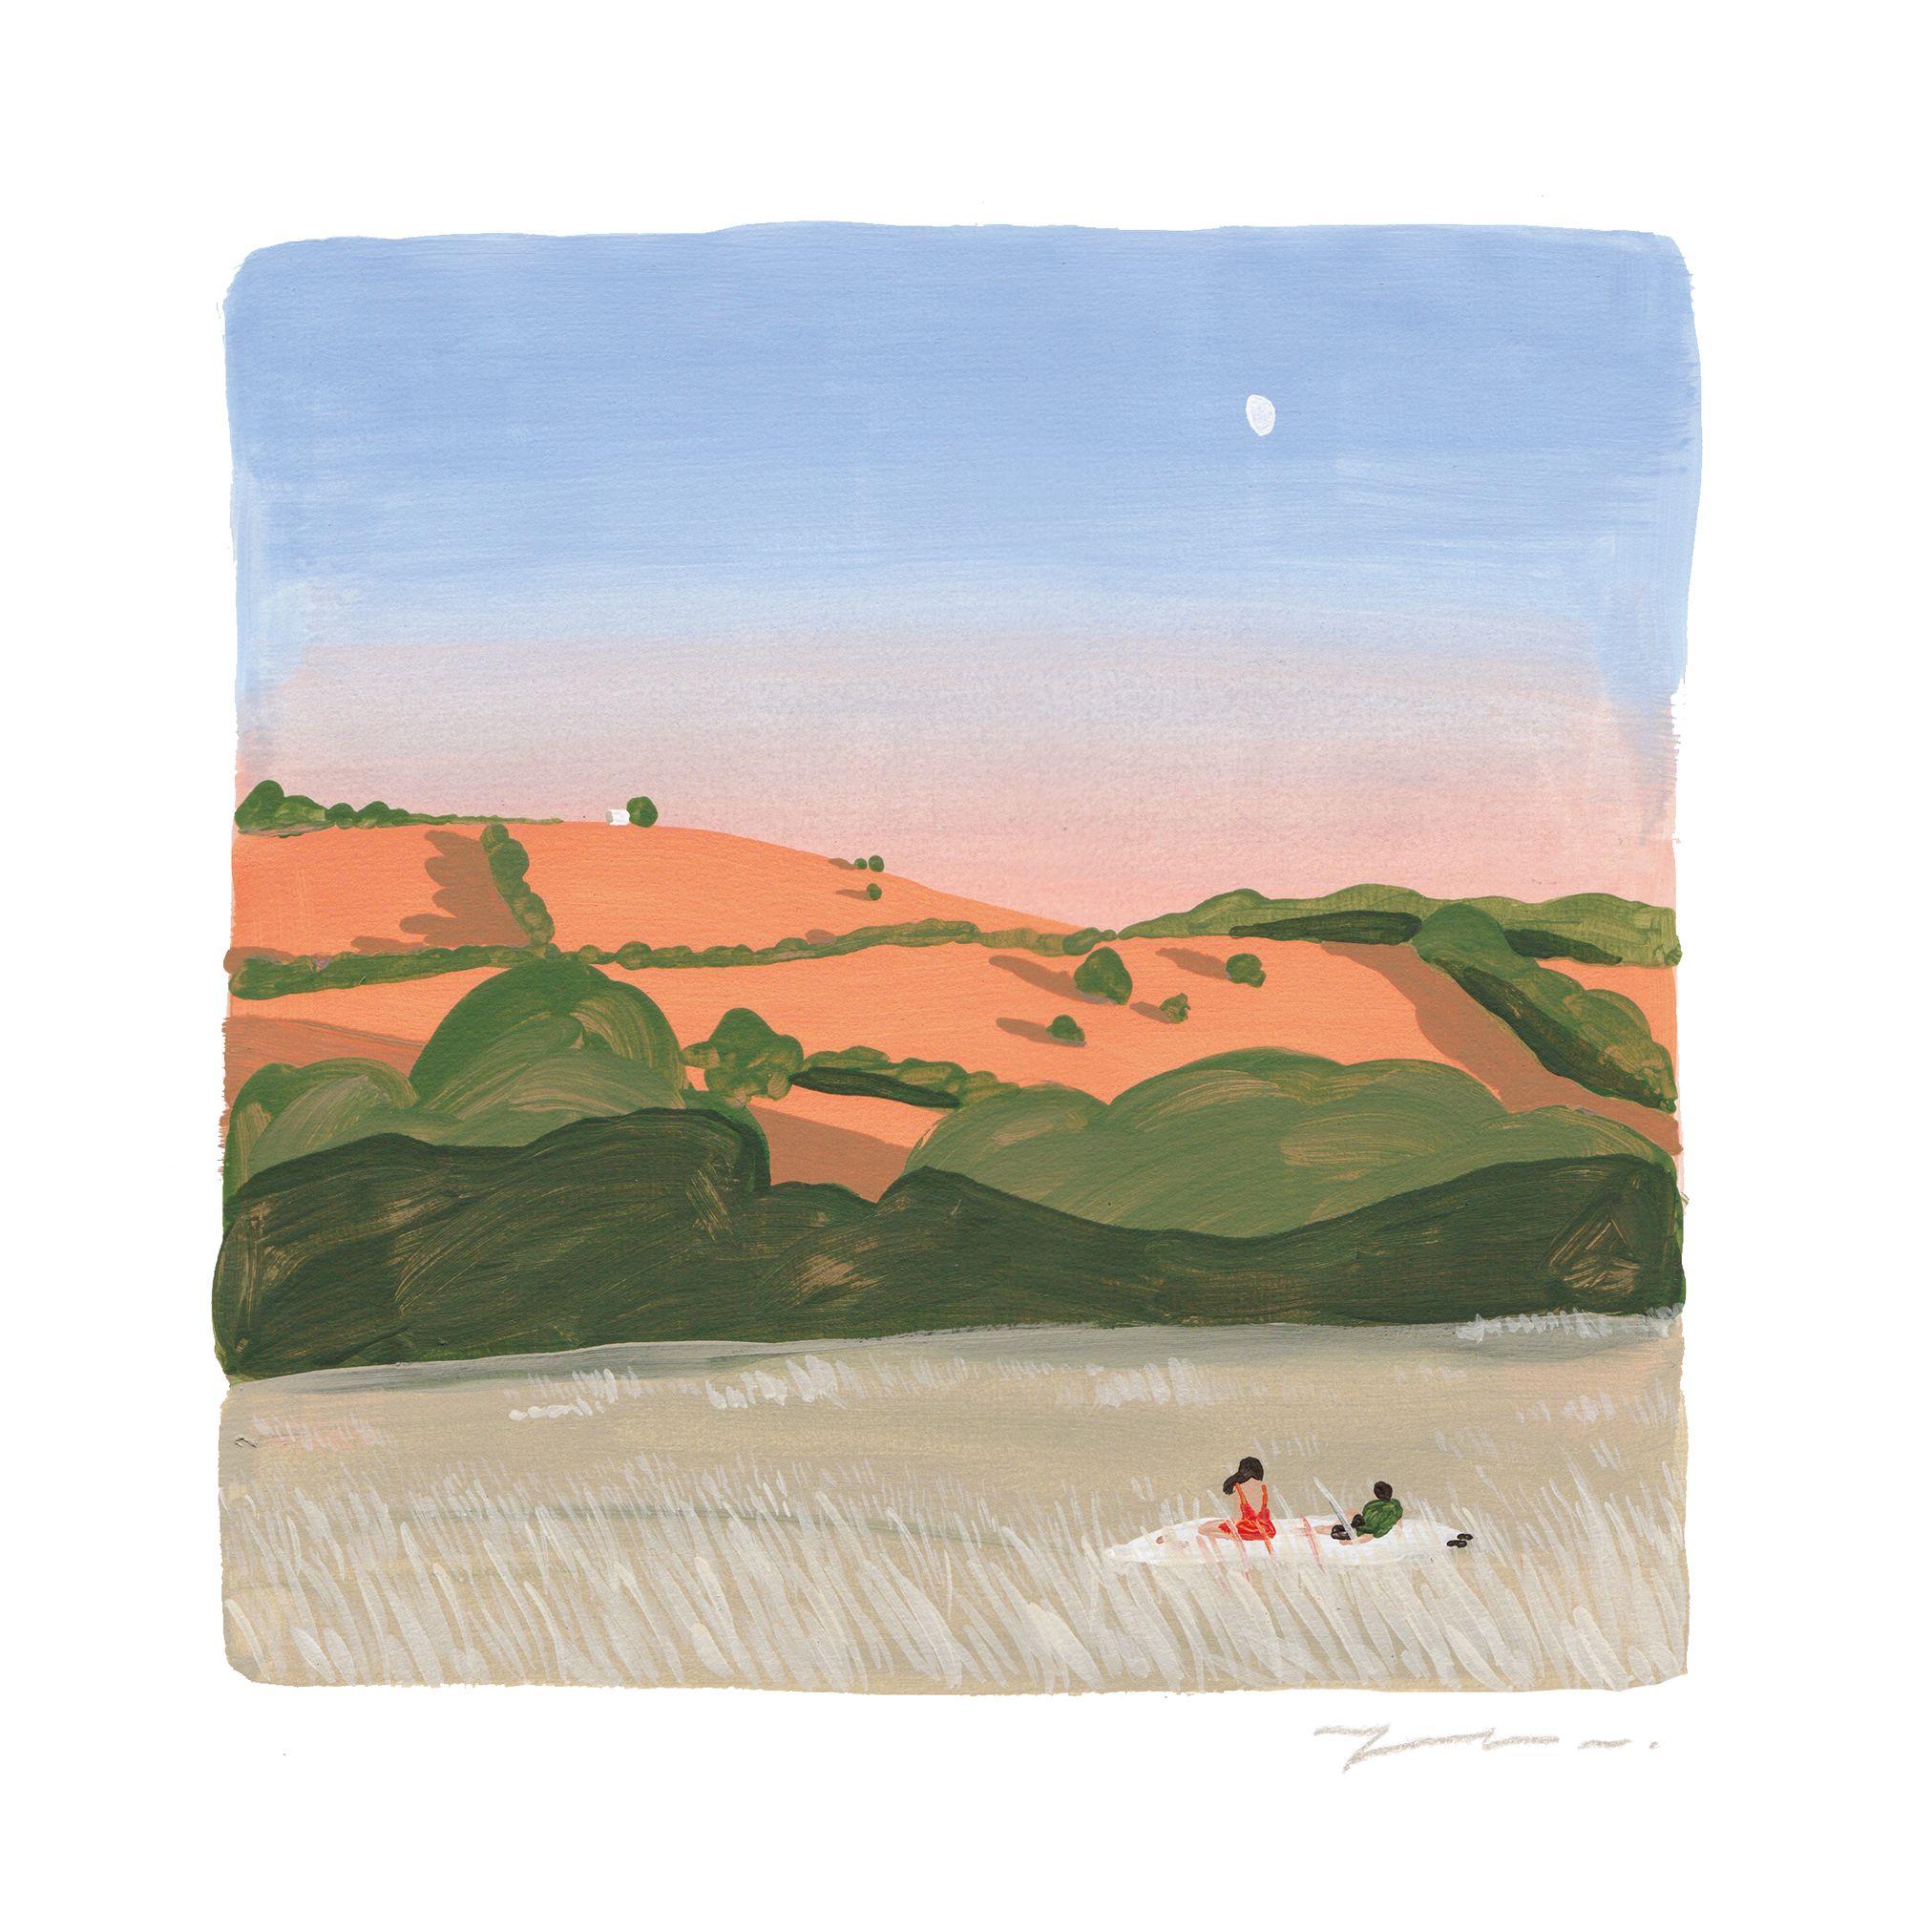 garance-illustration-Yukiko-Noritake-Projet-perso_13_Saint-didier-sur-arroux_web